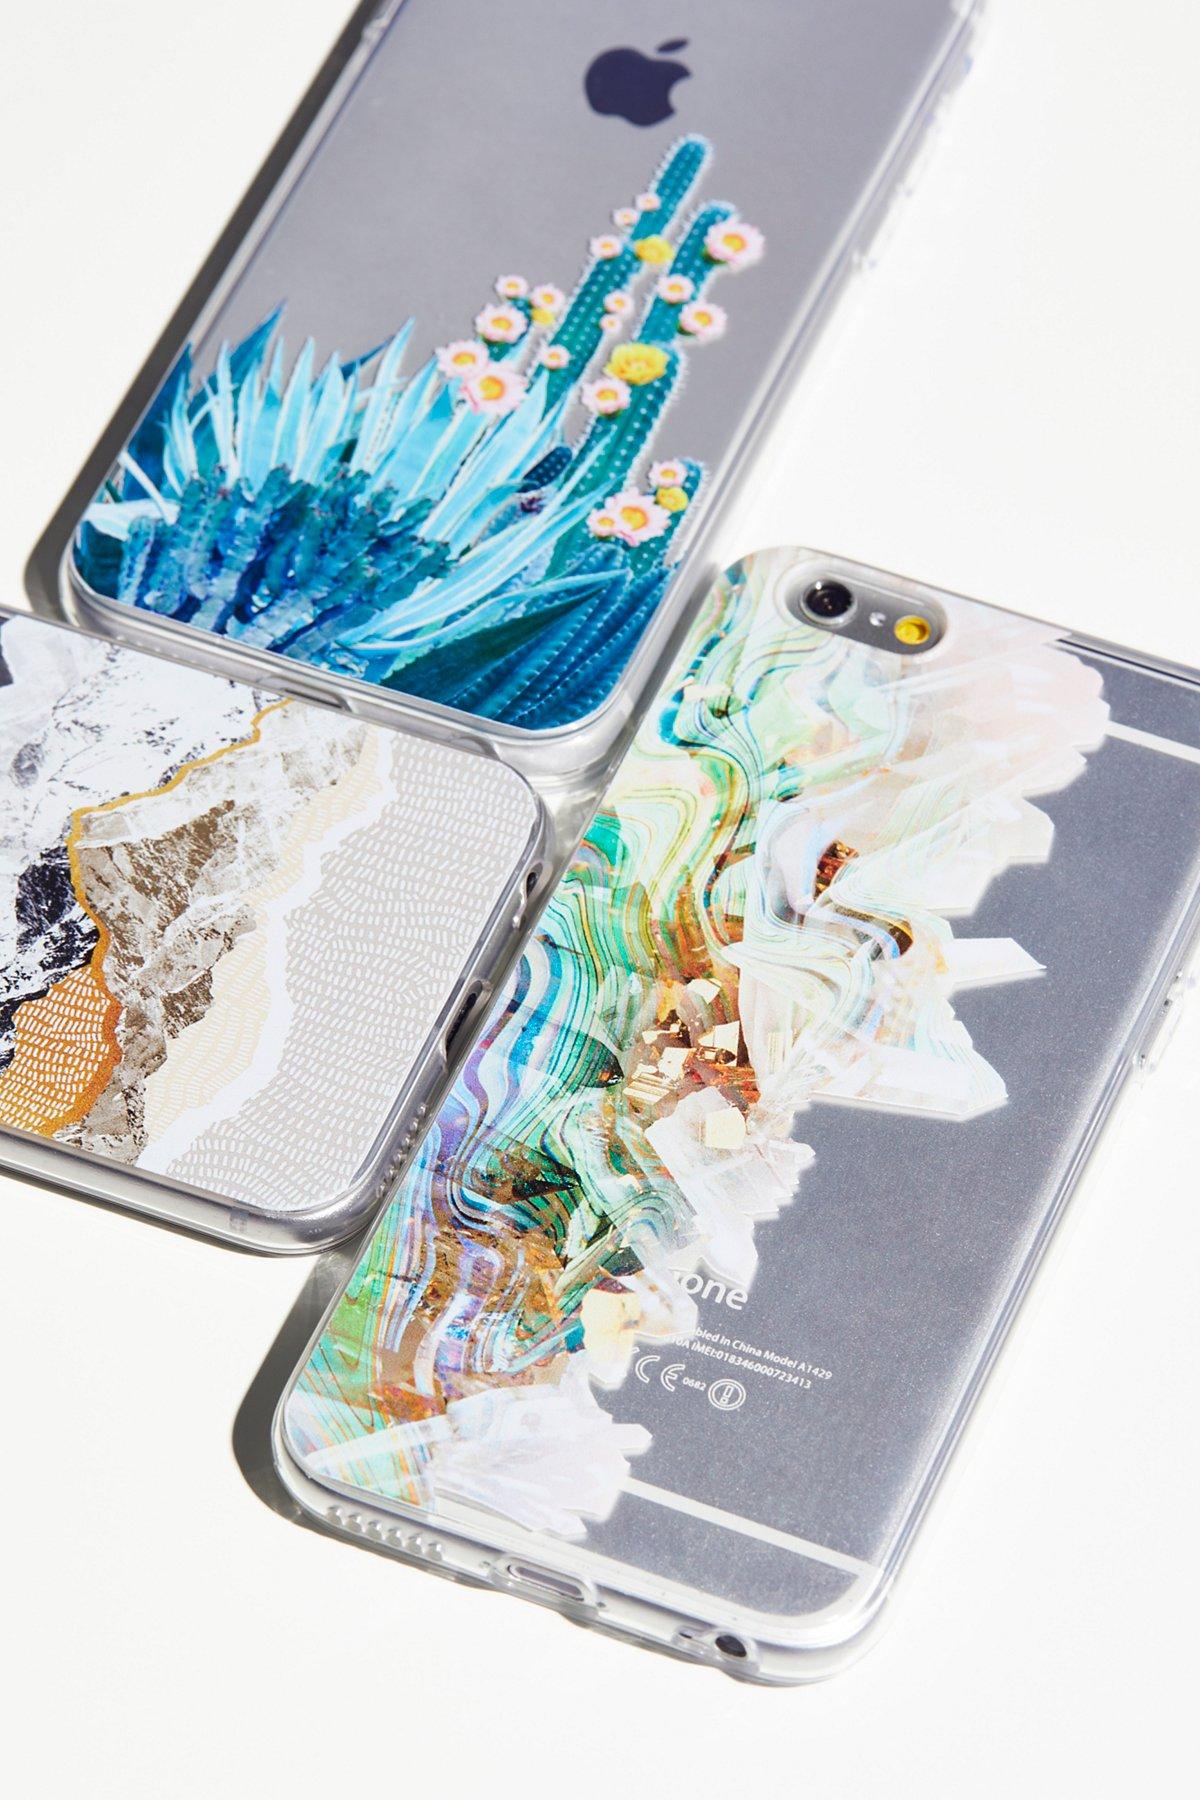 Technicolor Iphone手机壳